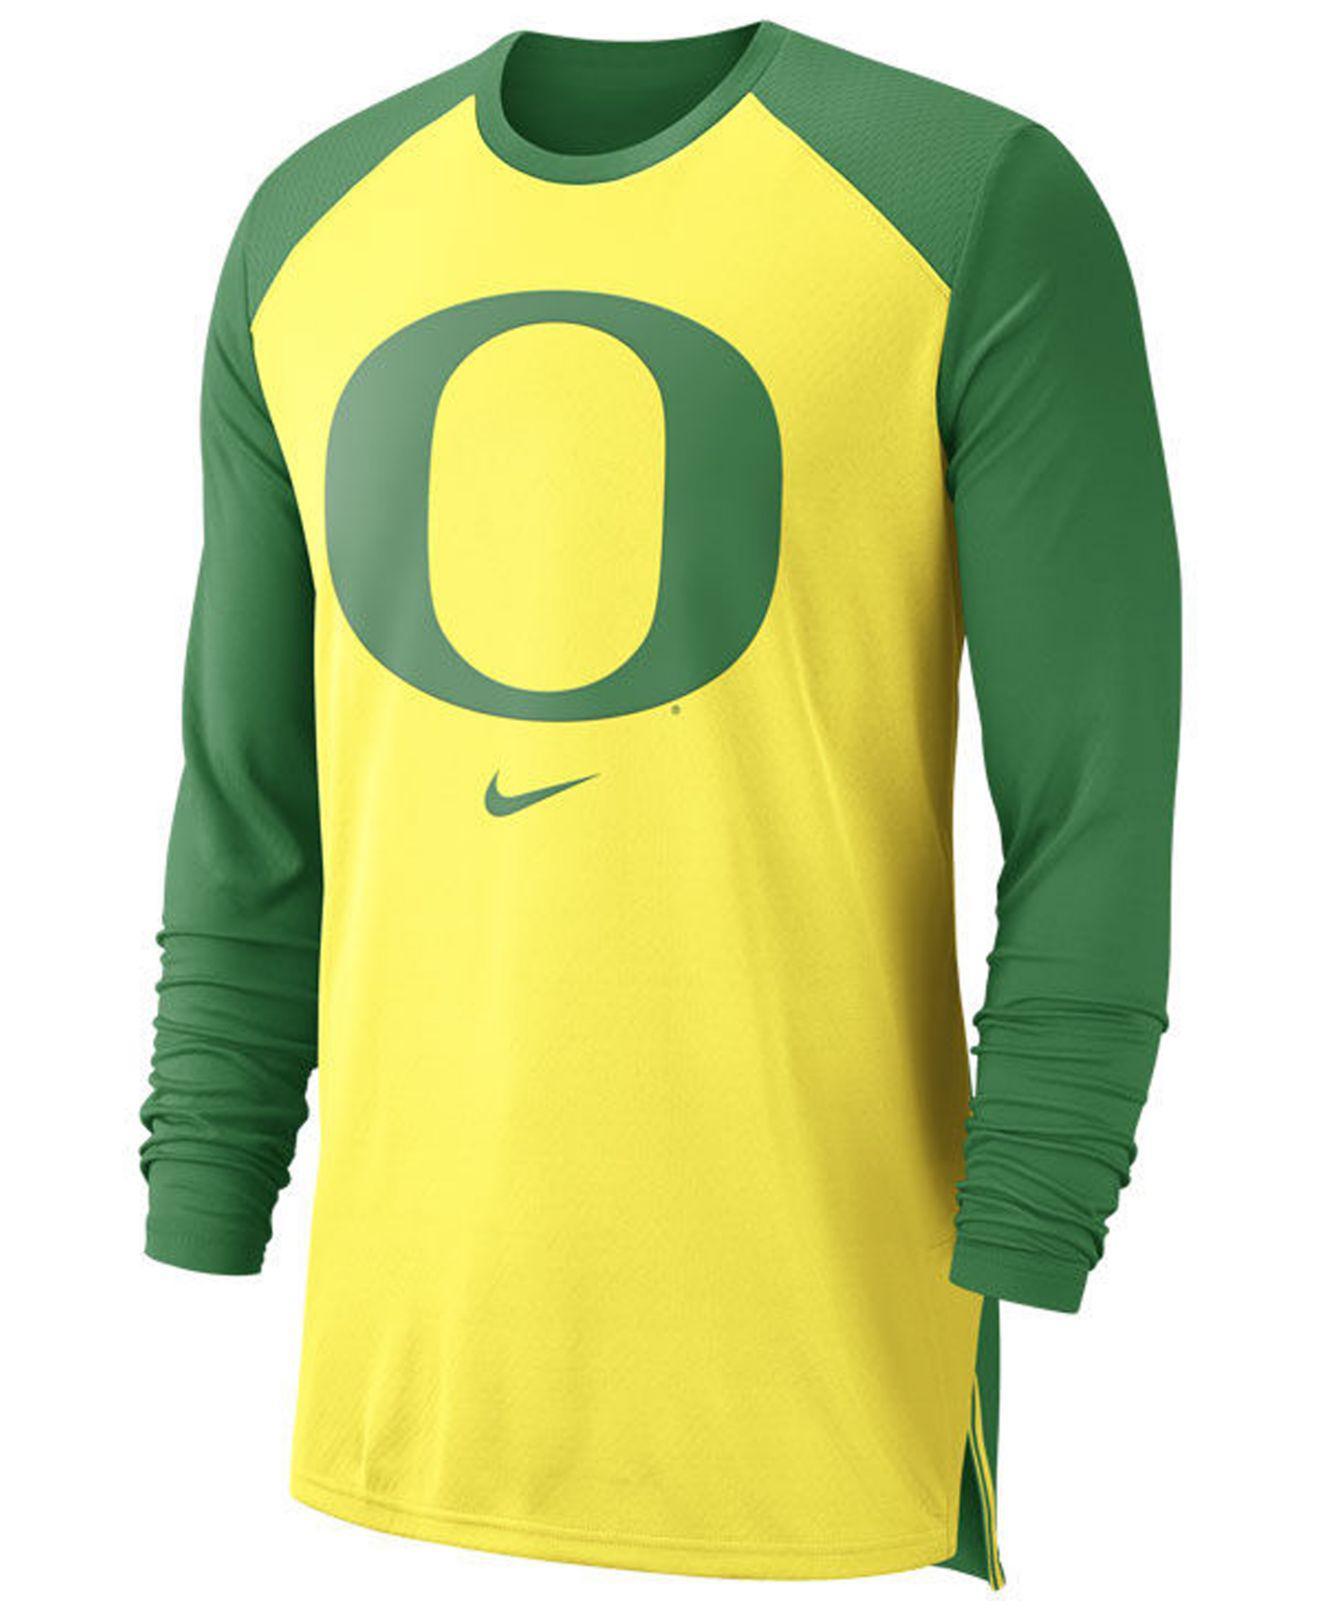 low priced fa2d8 7676d Oregon Ducks Nike Logo Cotton Long Sleeve T Shirt Yellow